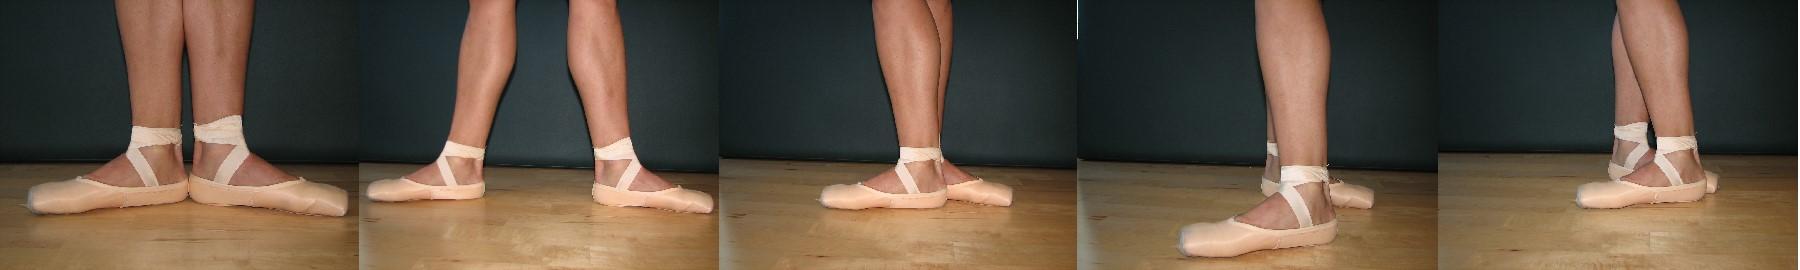 Ballet Dancer 5 positions